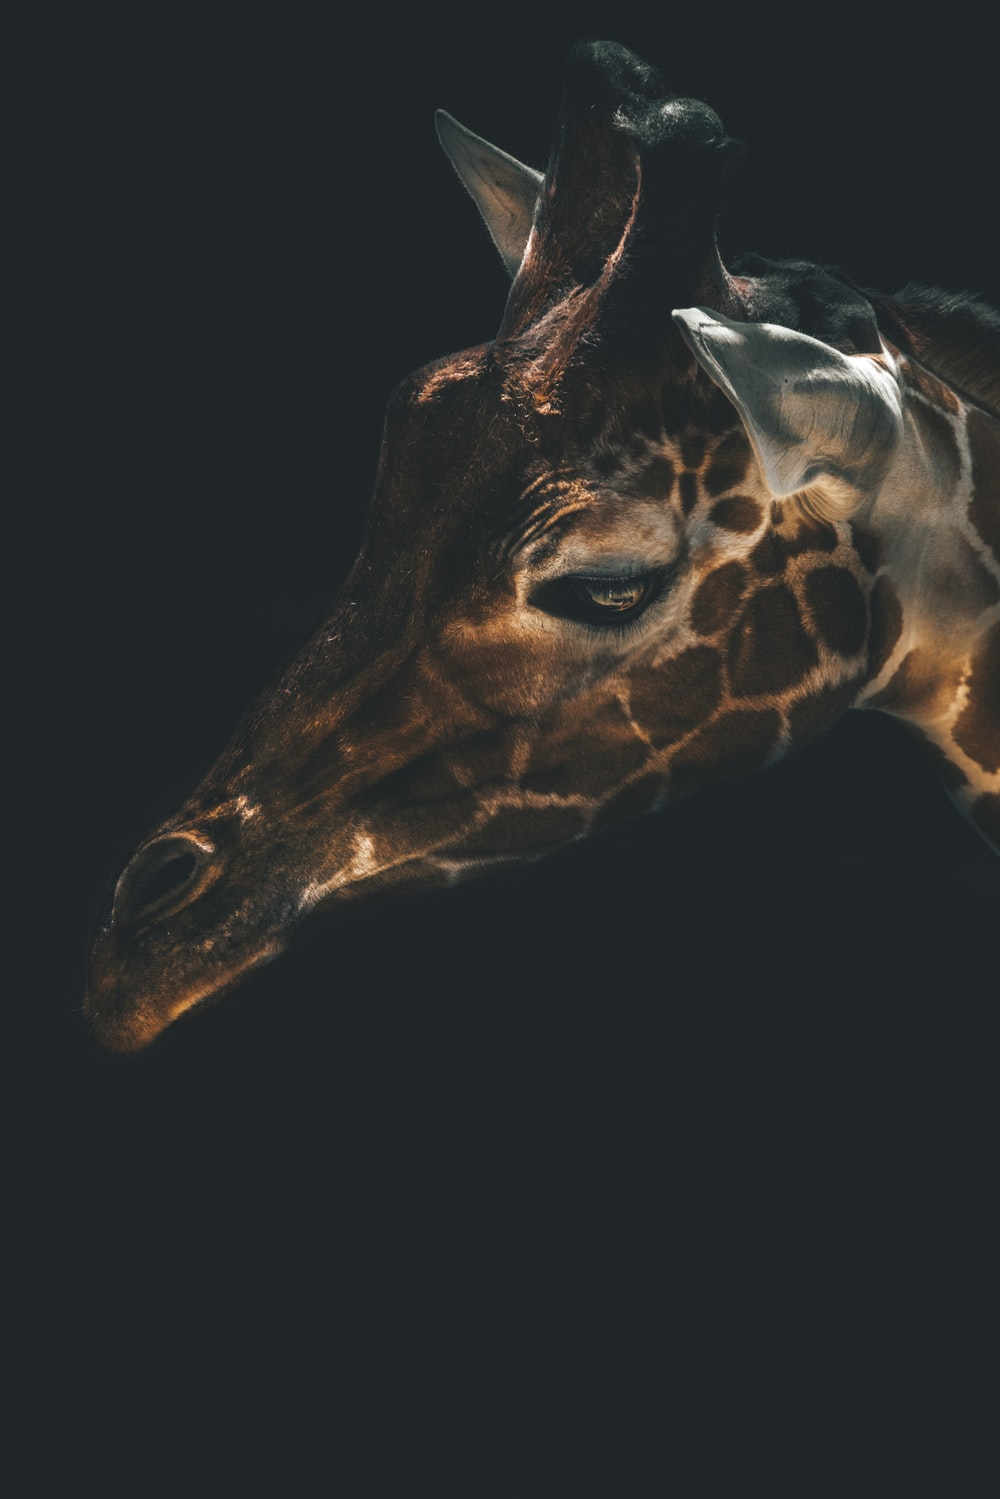 brown giraffe head with black background